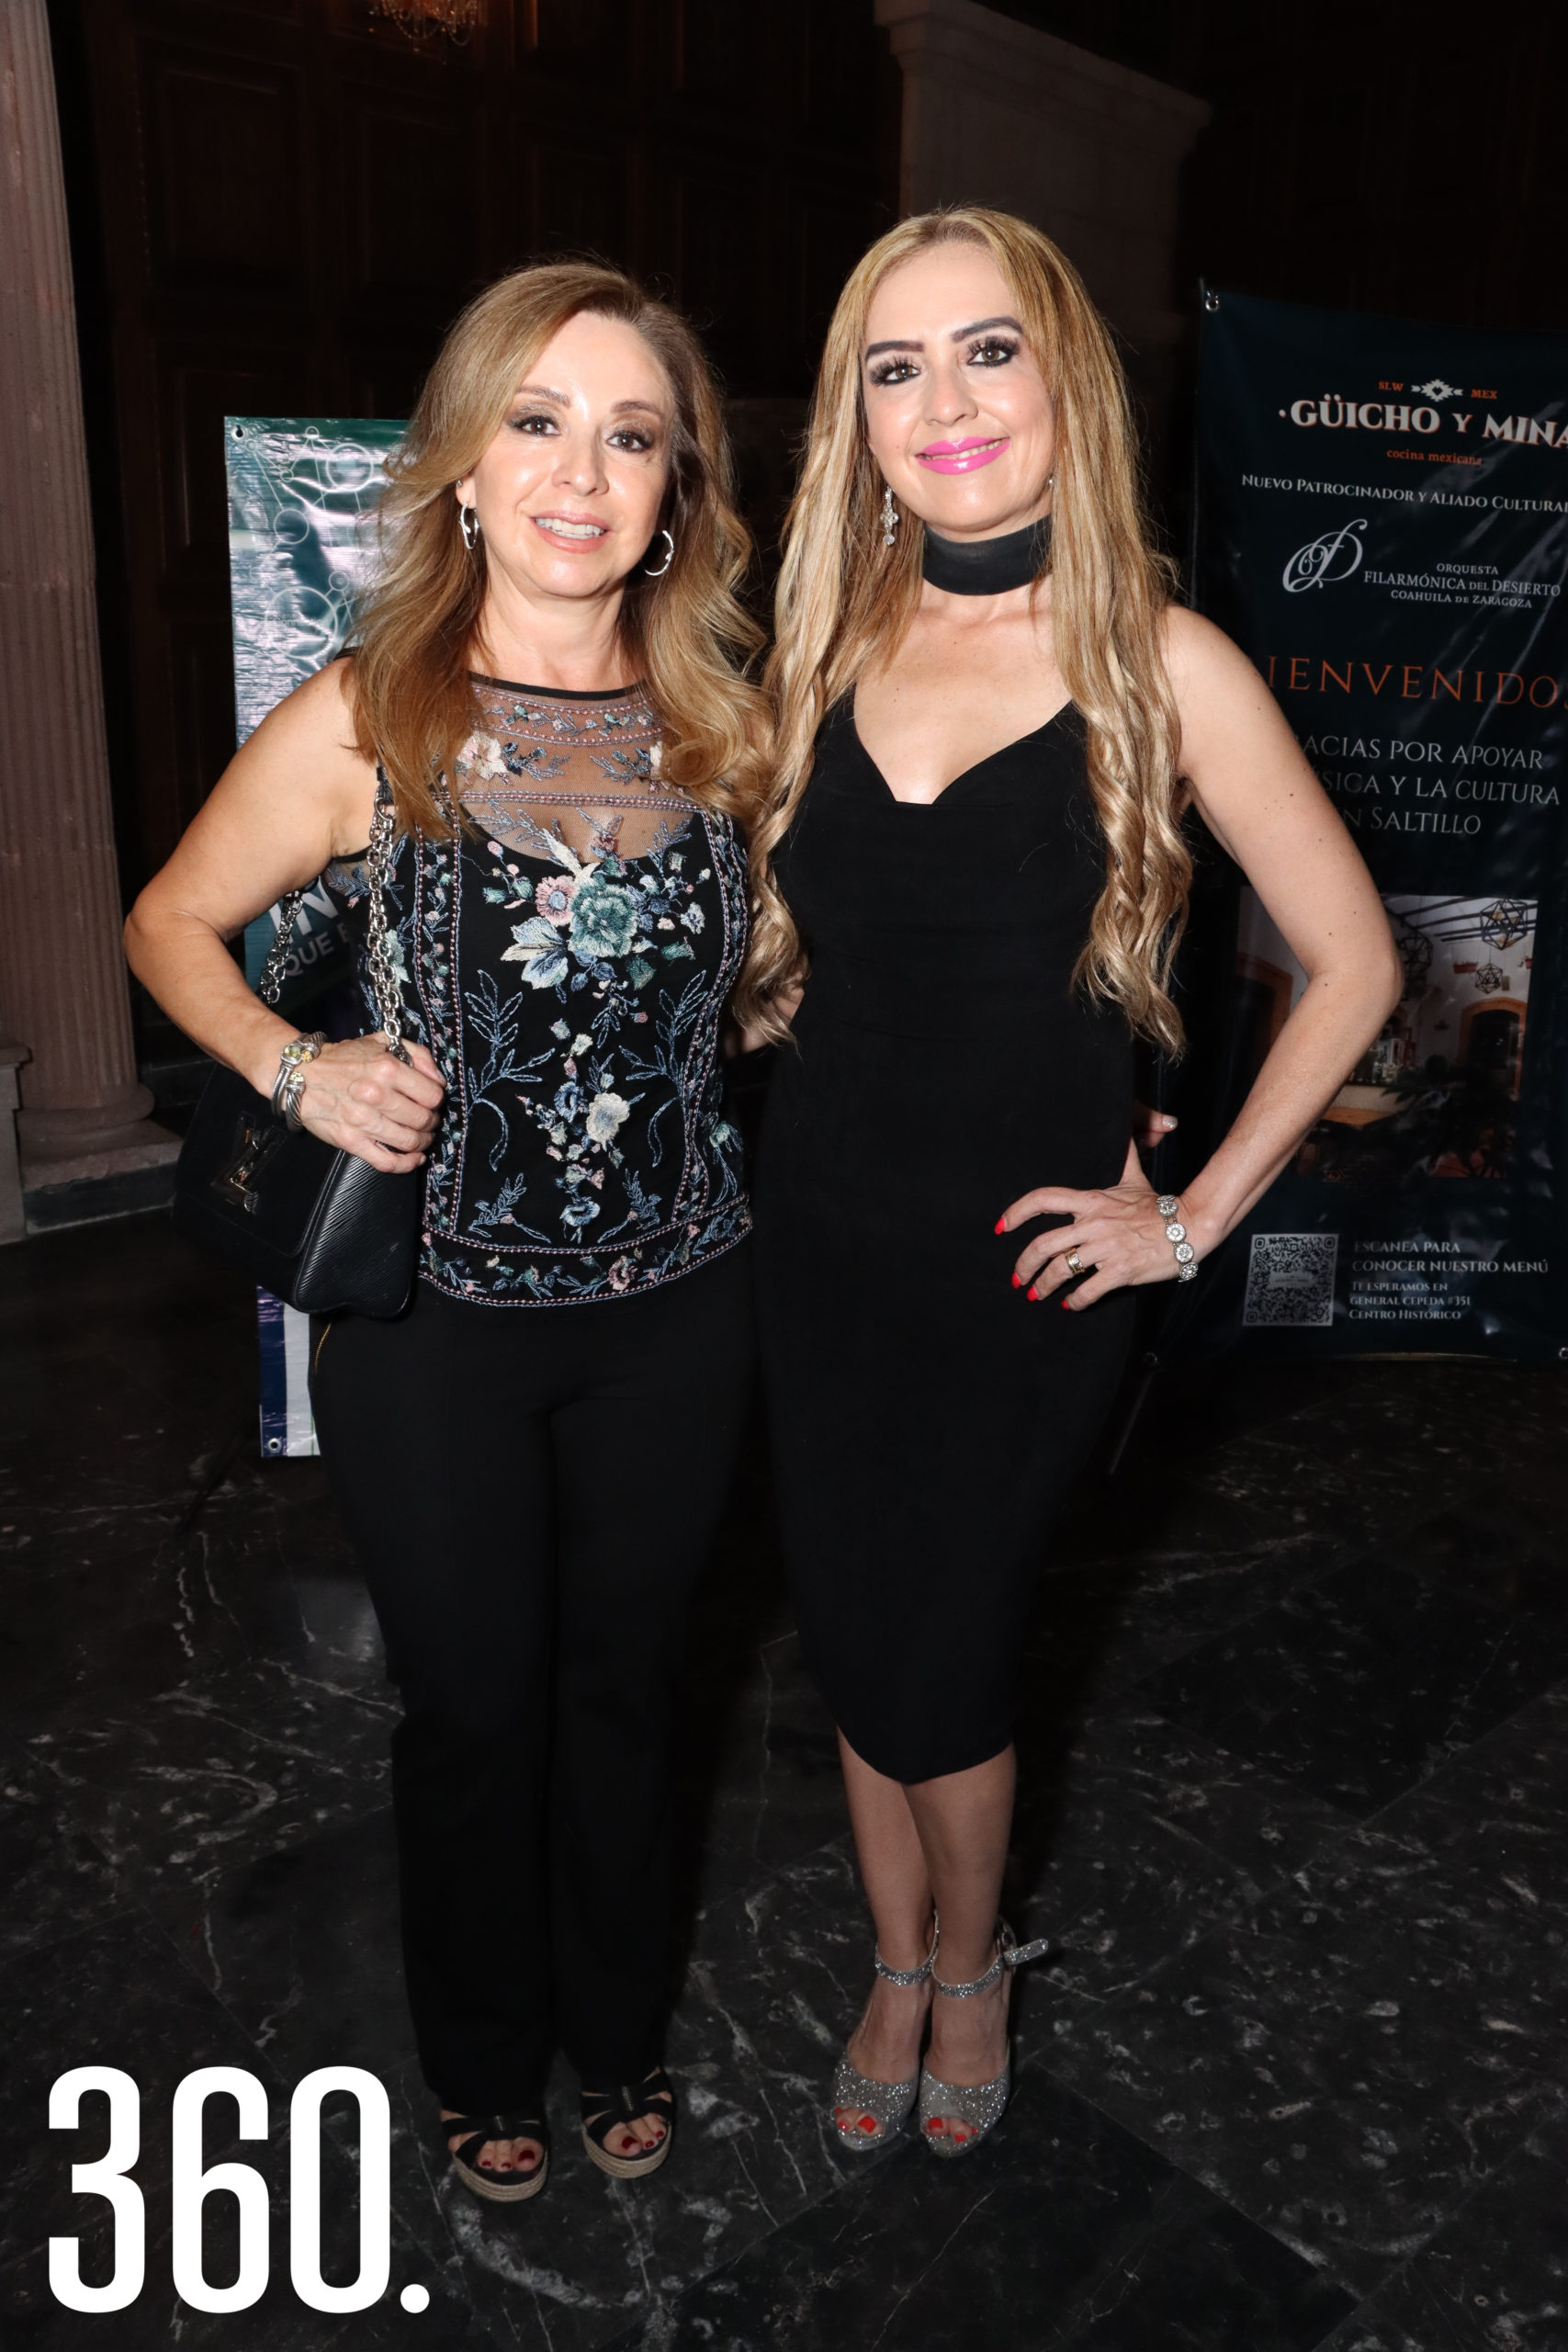 Betty Valero y Luly Morales.